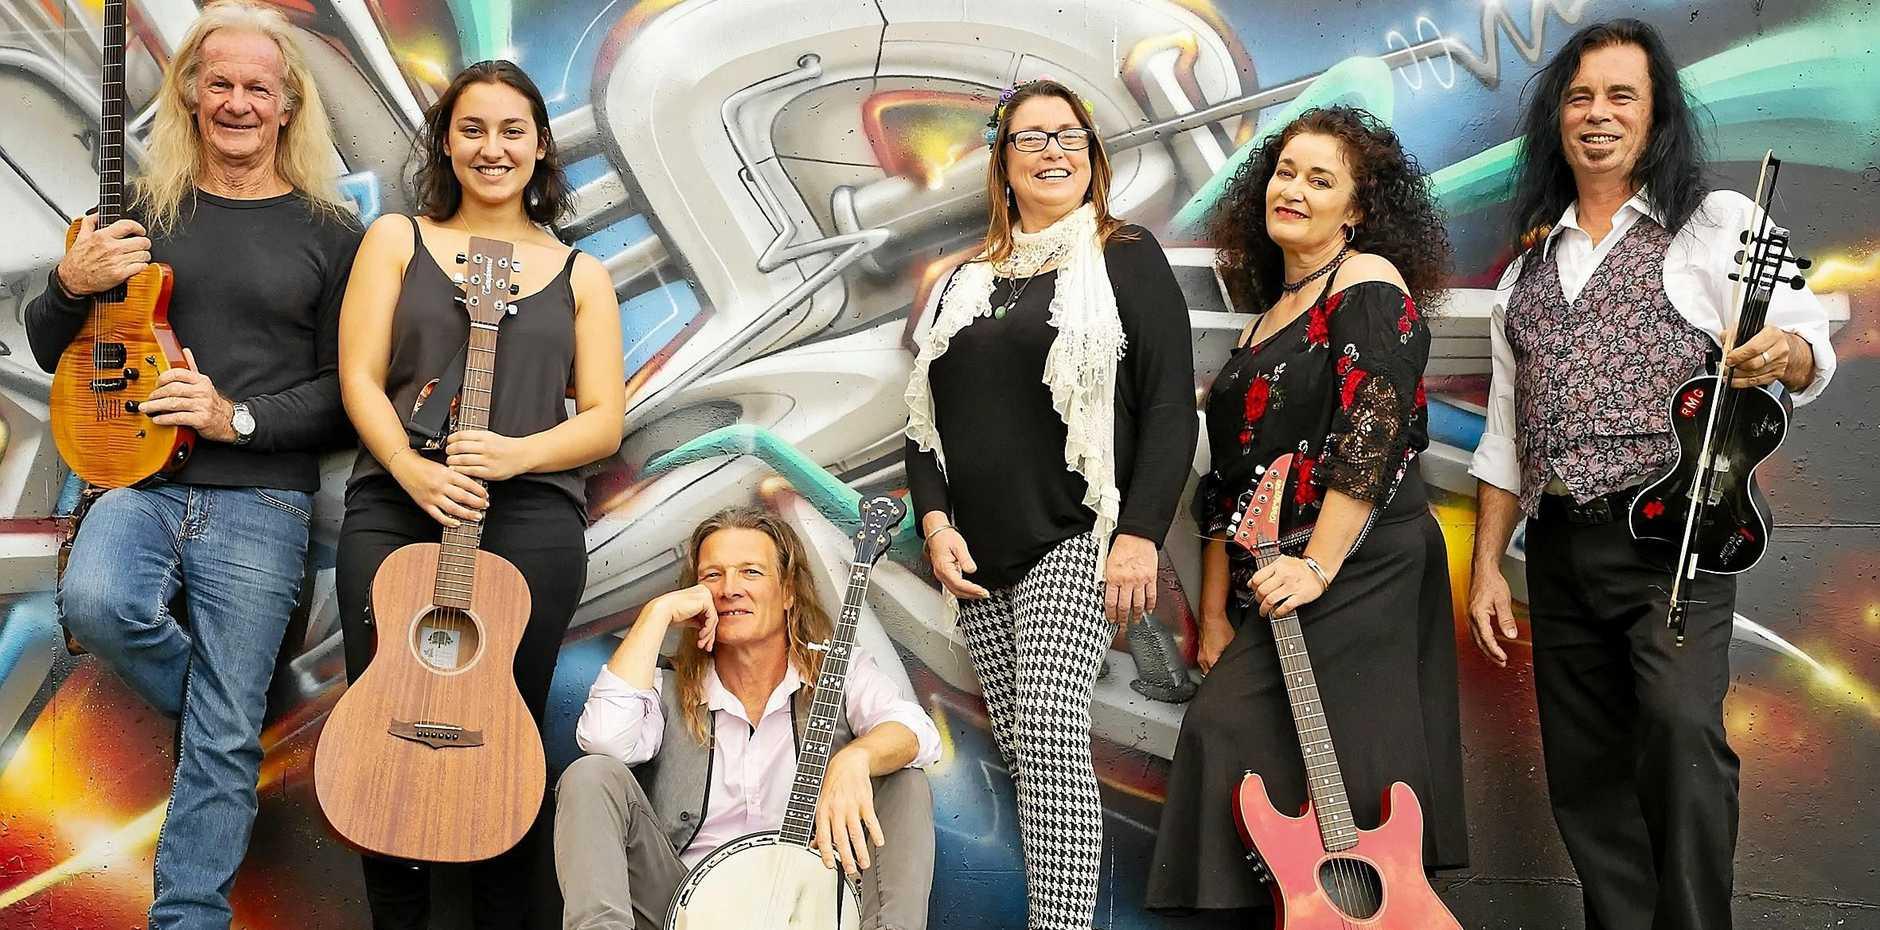 MOO FEST: Musicians Ray Cat, Natasha Bitancurt, Chris Eaton, Andrea Deeley and Paul Robinson with organiser of Moo Fest, Joanne Mitchell.